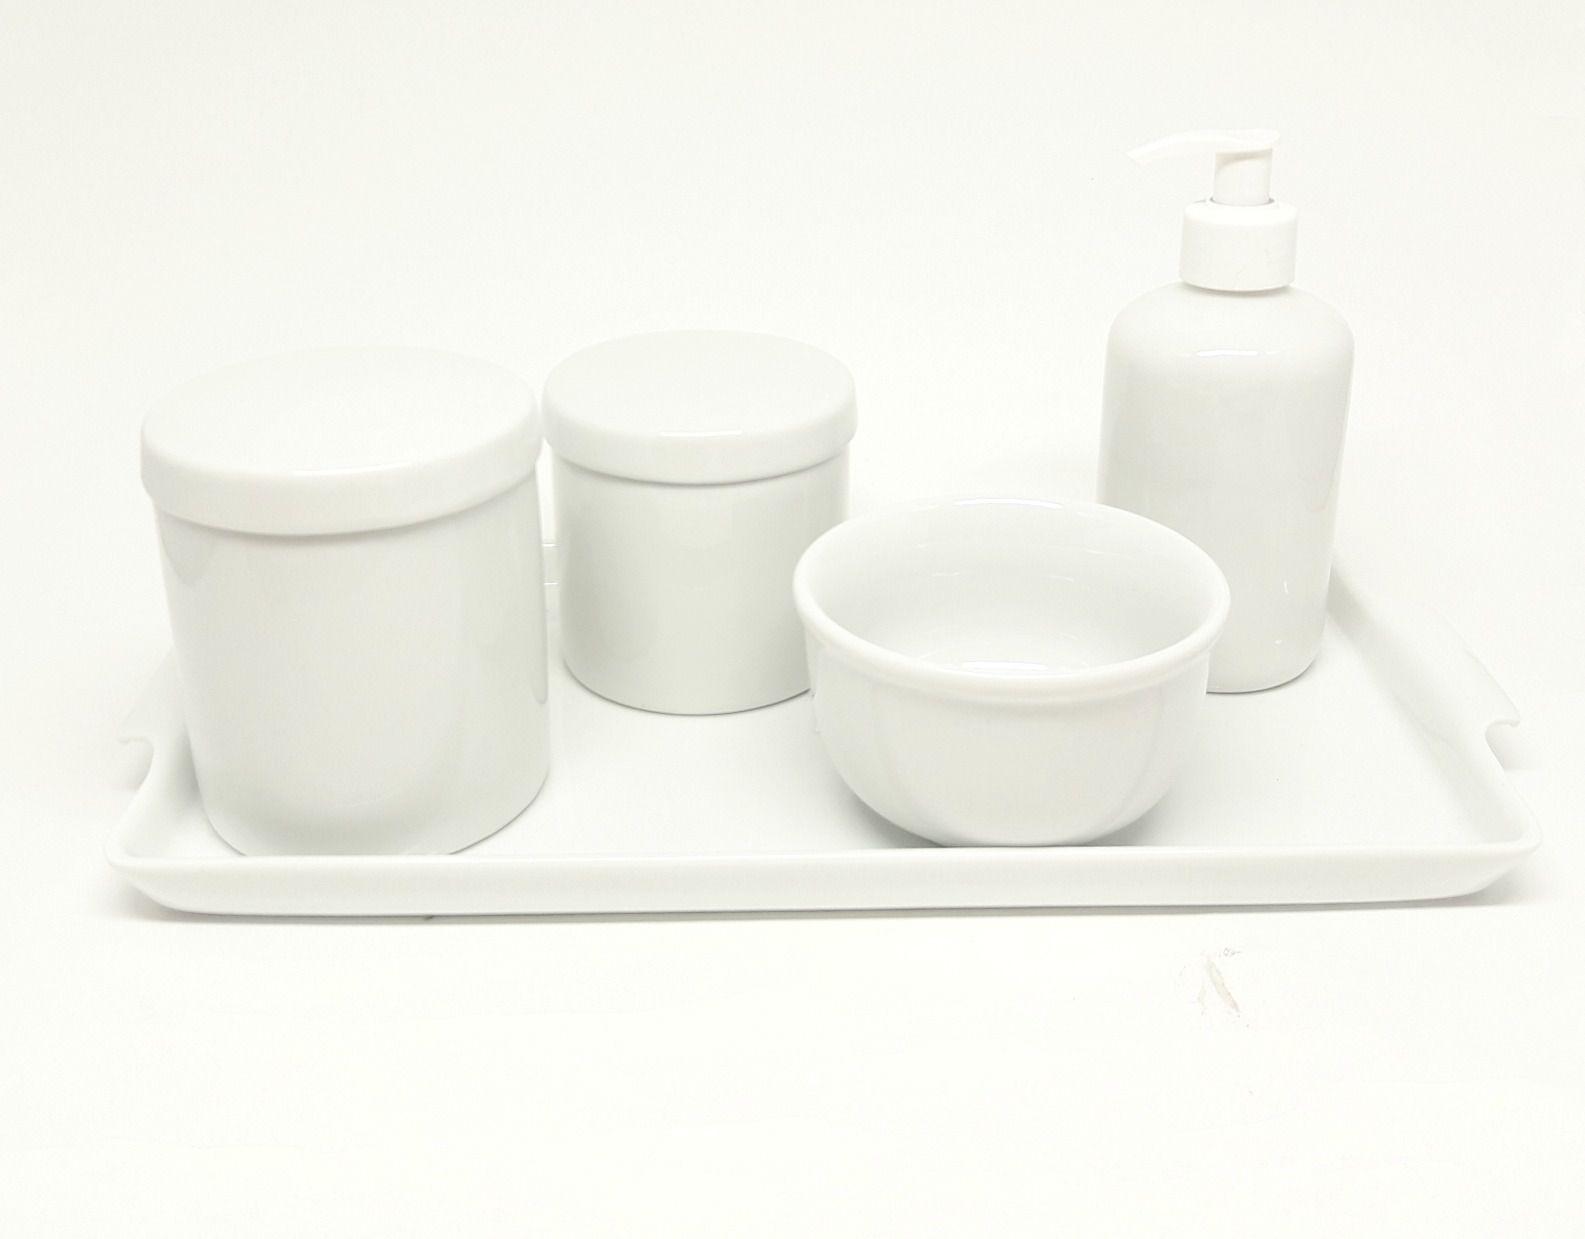 Kit Higiene Bebê Porcelana Branca lisa com Bandeja em porcelana grande (34 por 17 cm)